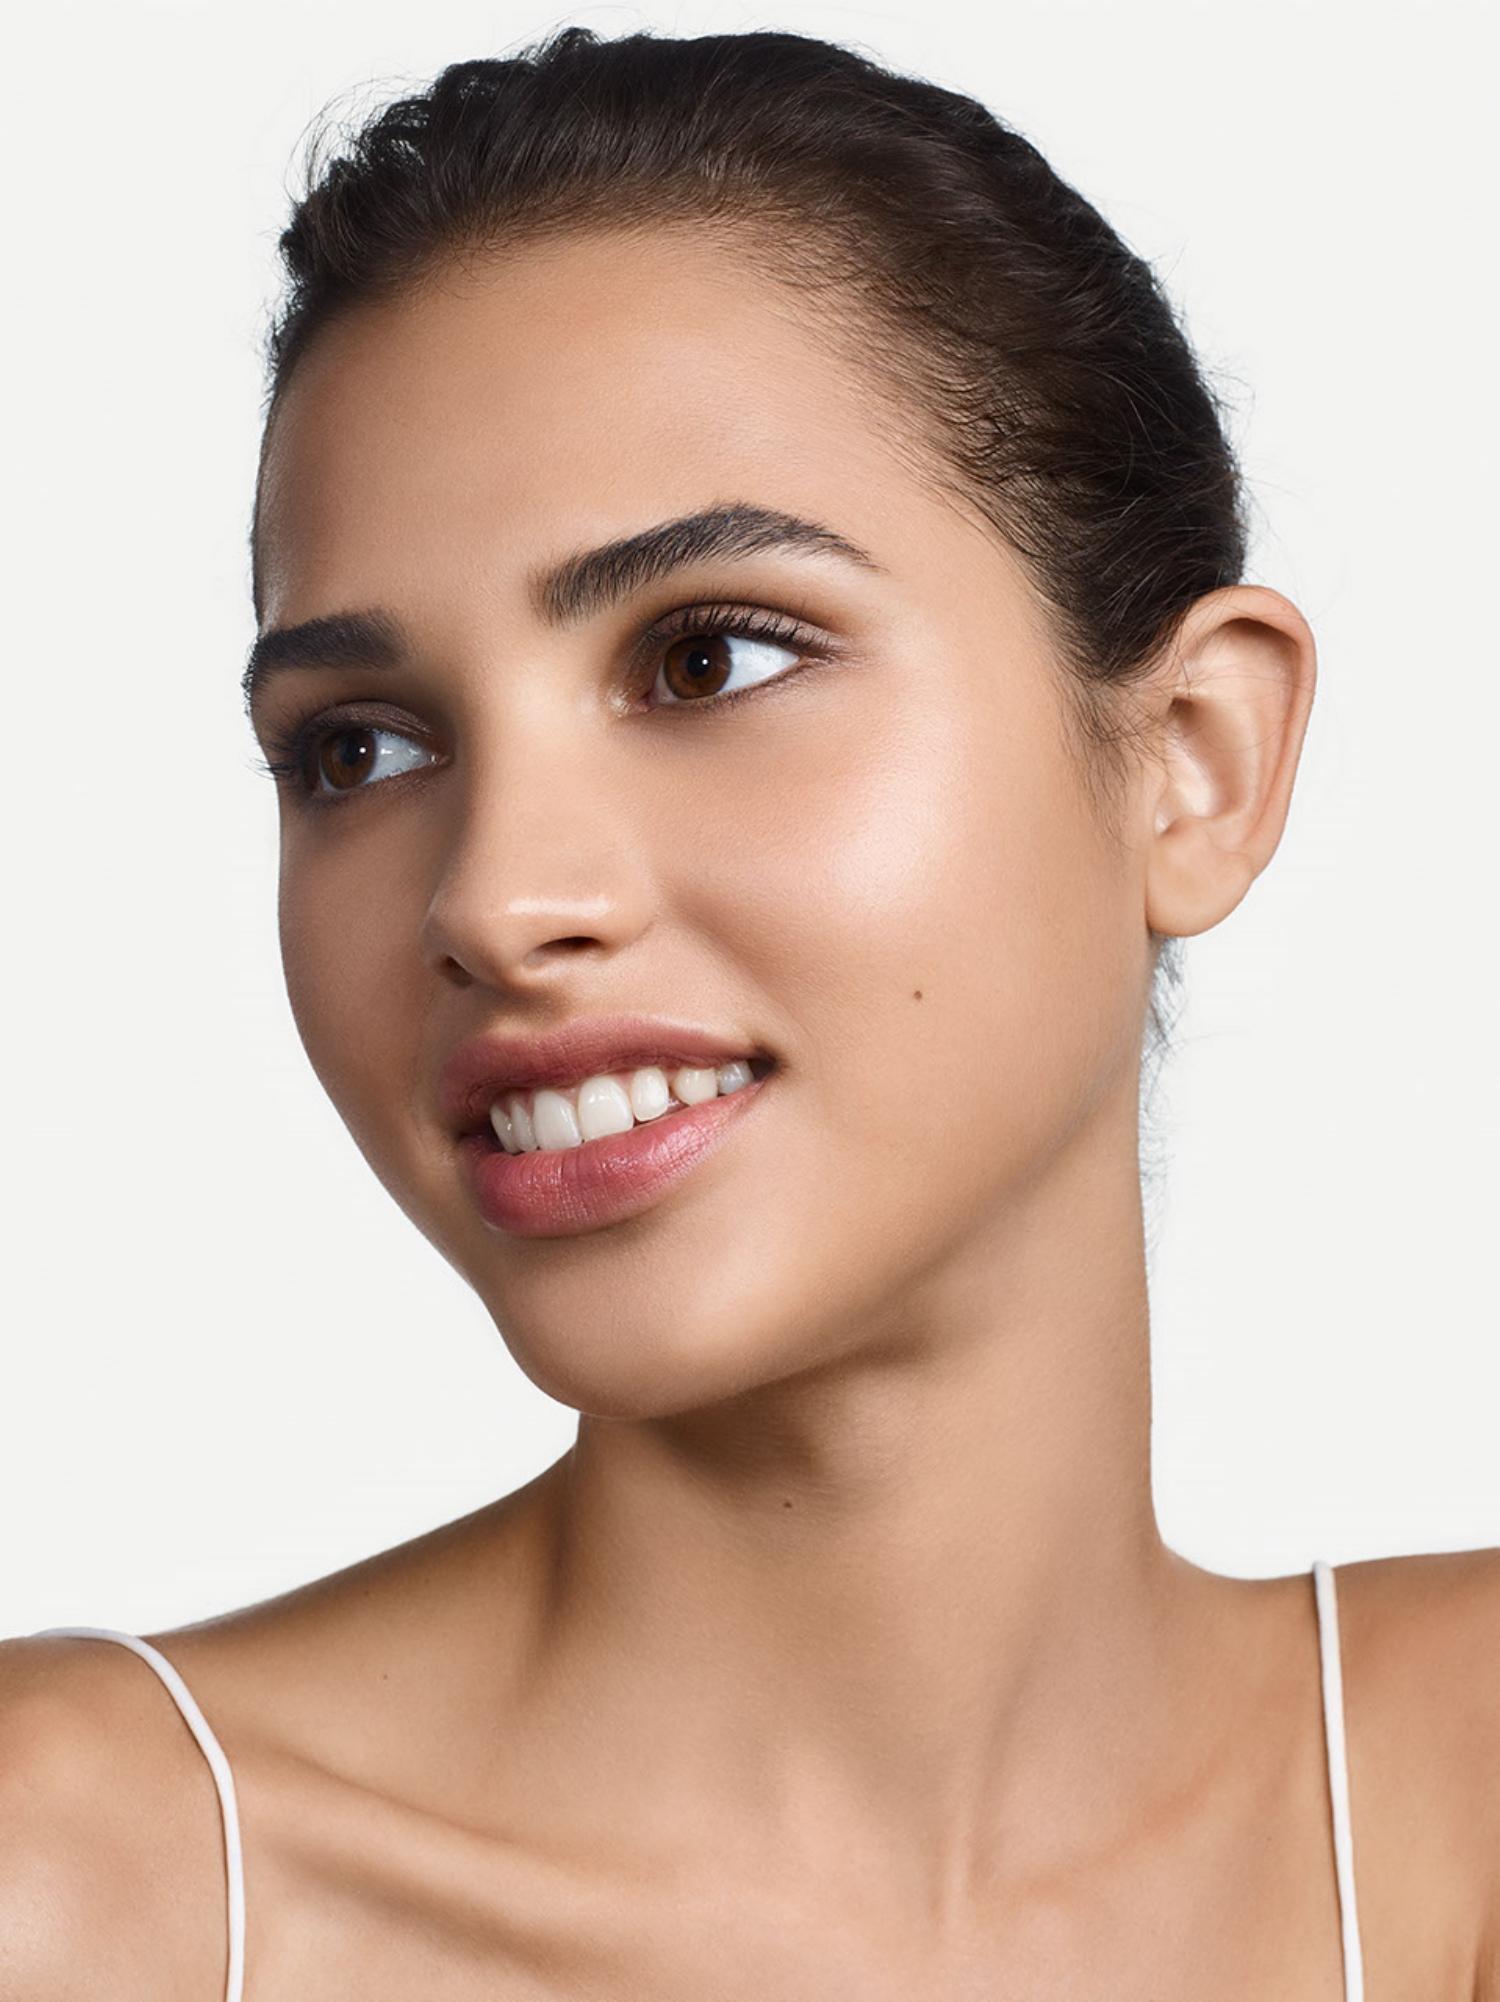 Clinique Even Better Refresh Hydratig & Repairing Makeup, cn 52 neutral